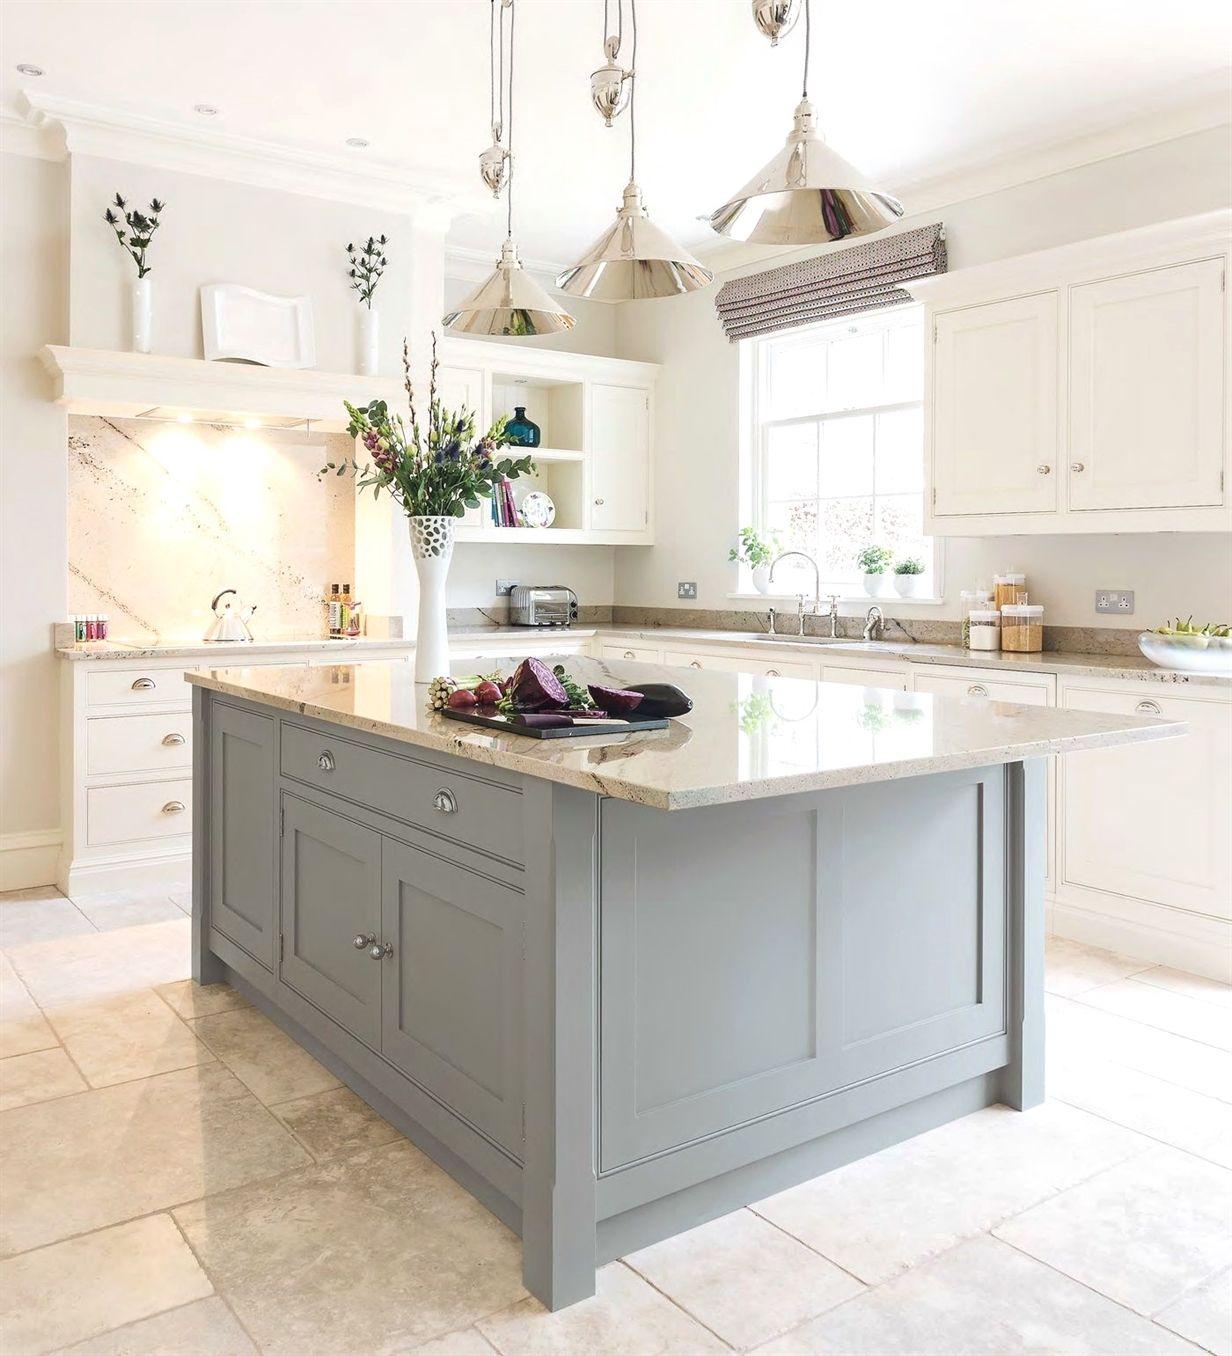 tom howley s classic hartford design beautiful kitchens january rh pinterest com